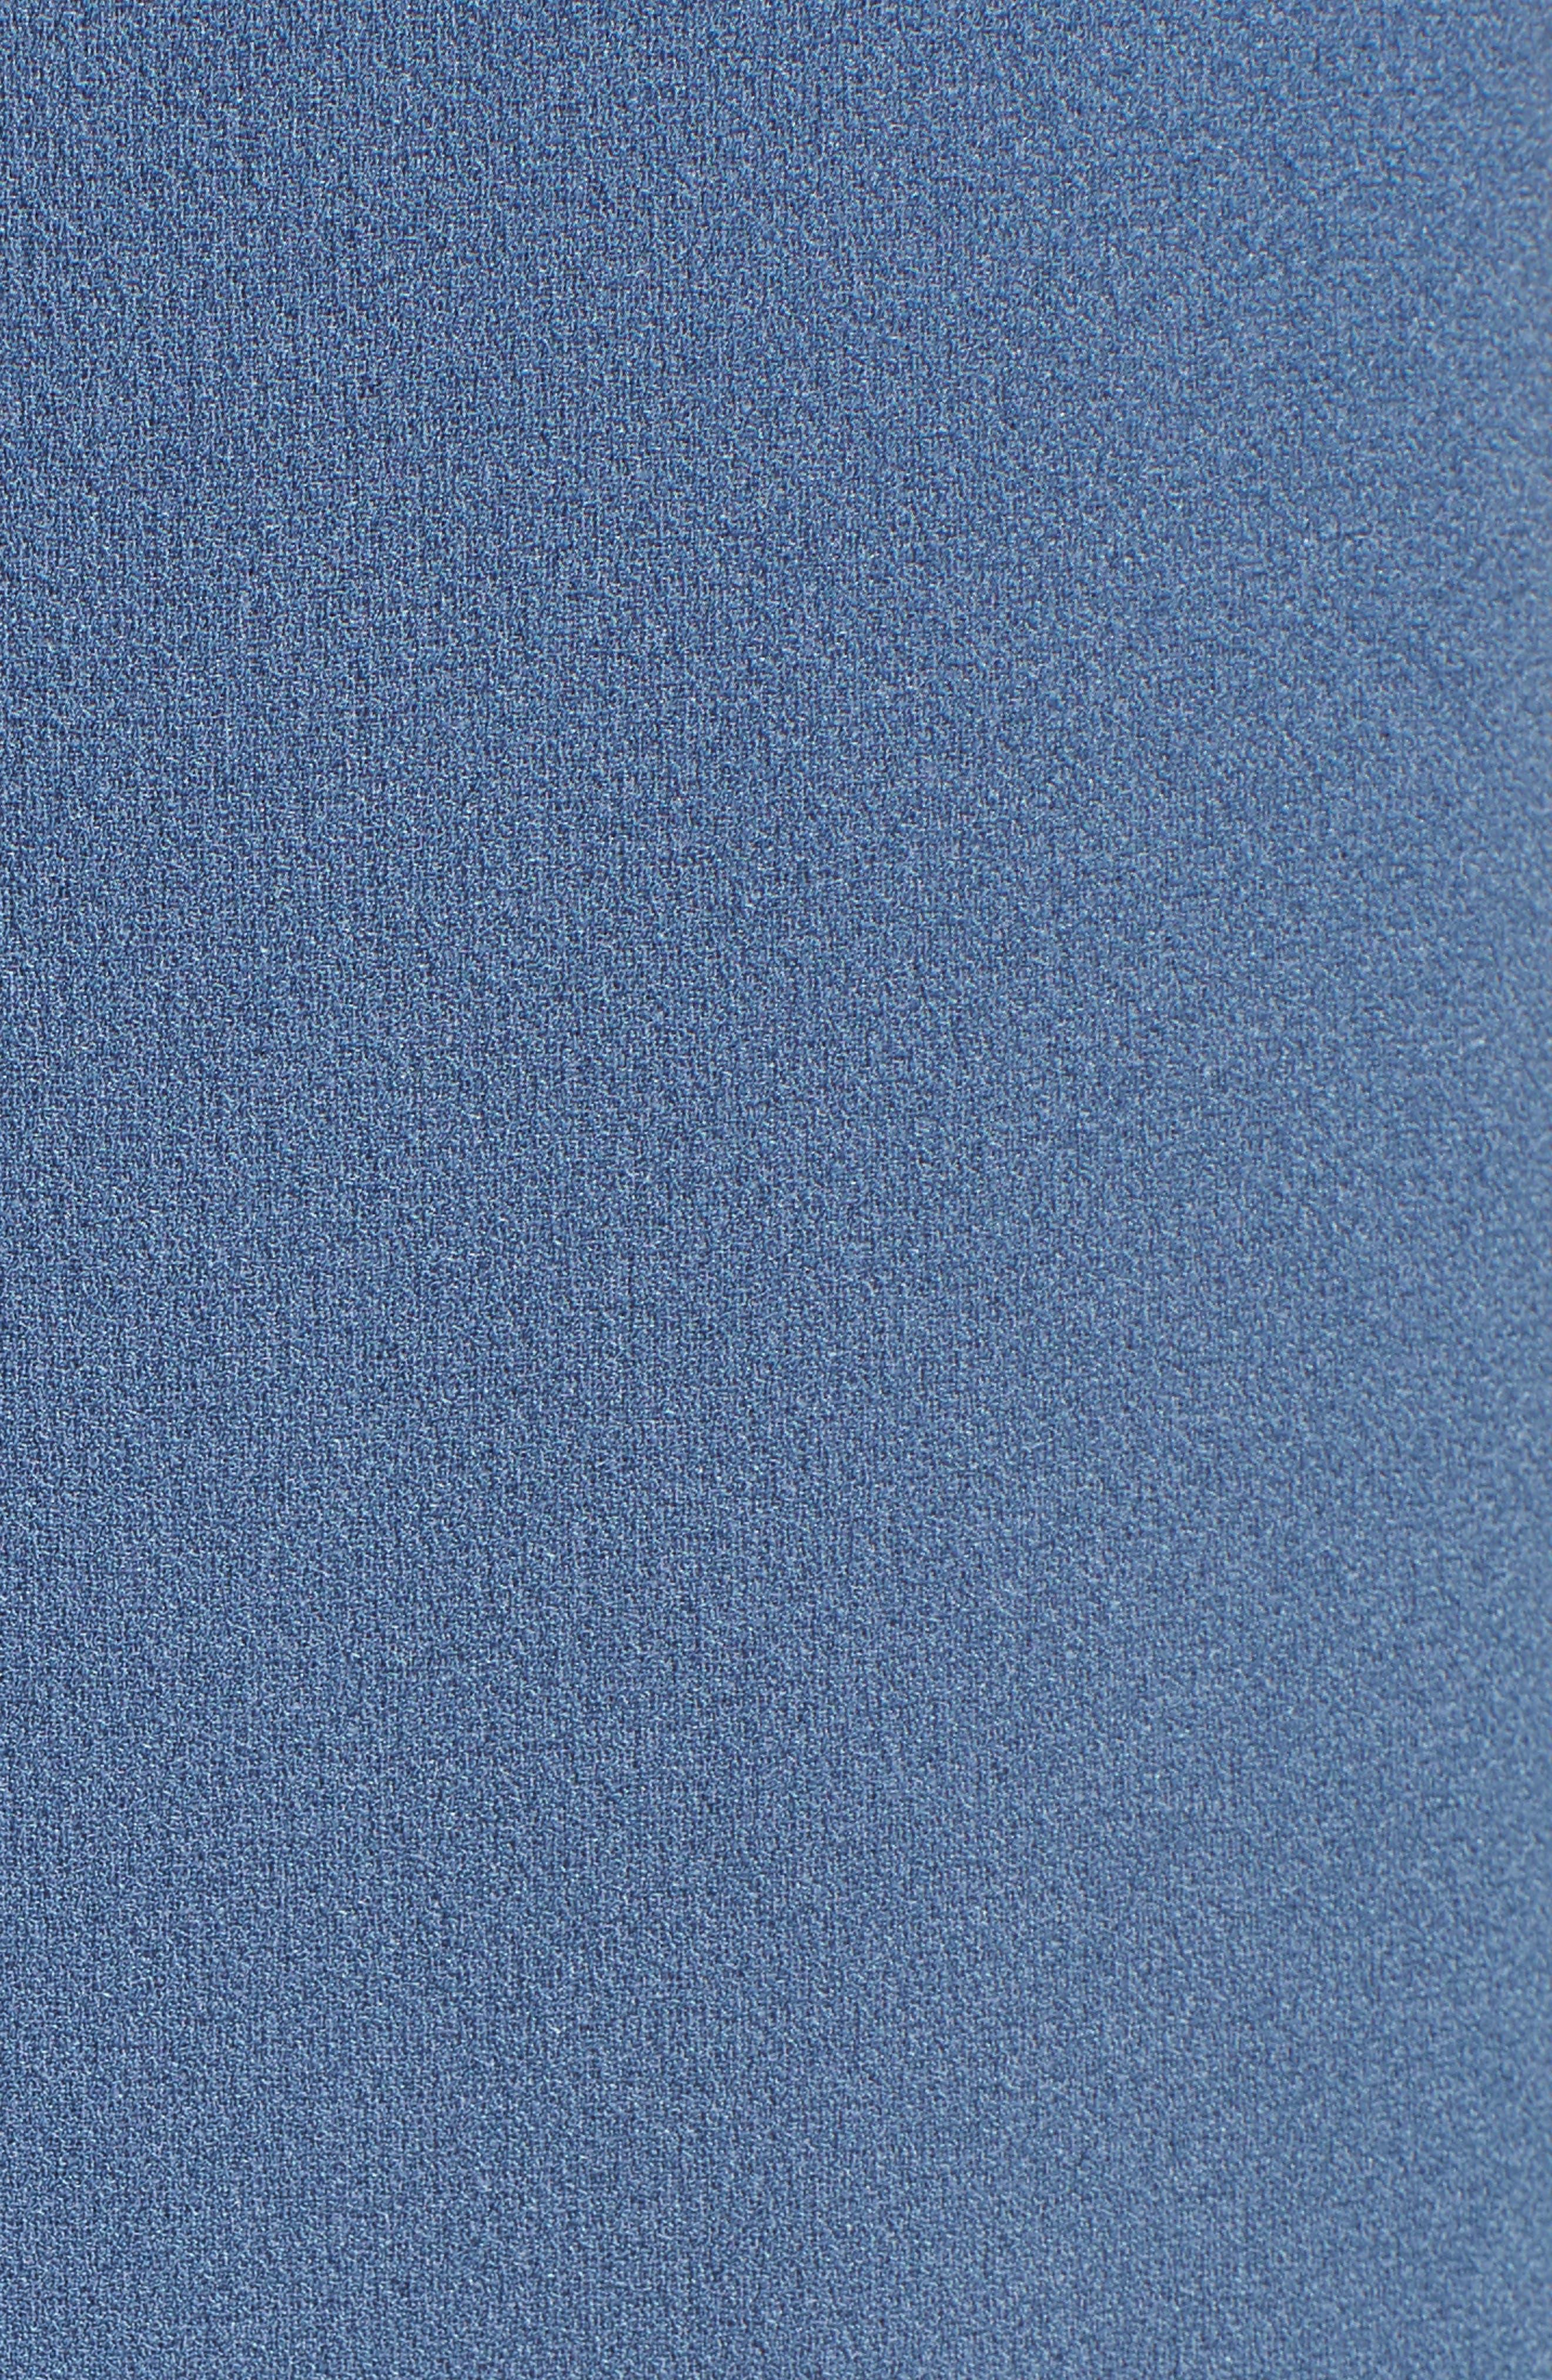 Hailey Crepe Dress,                             Alternate thumbnail 128, color,